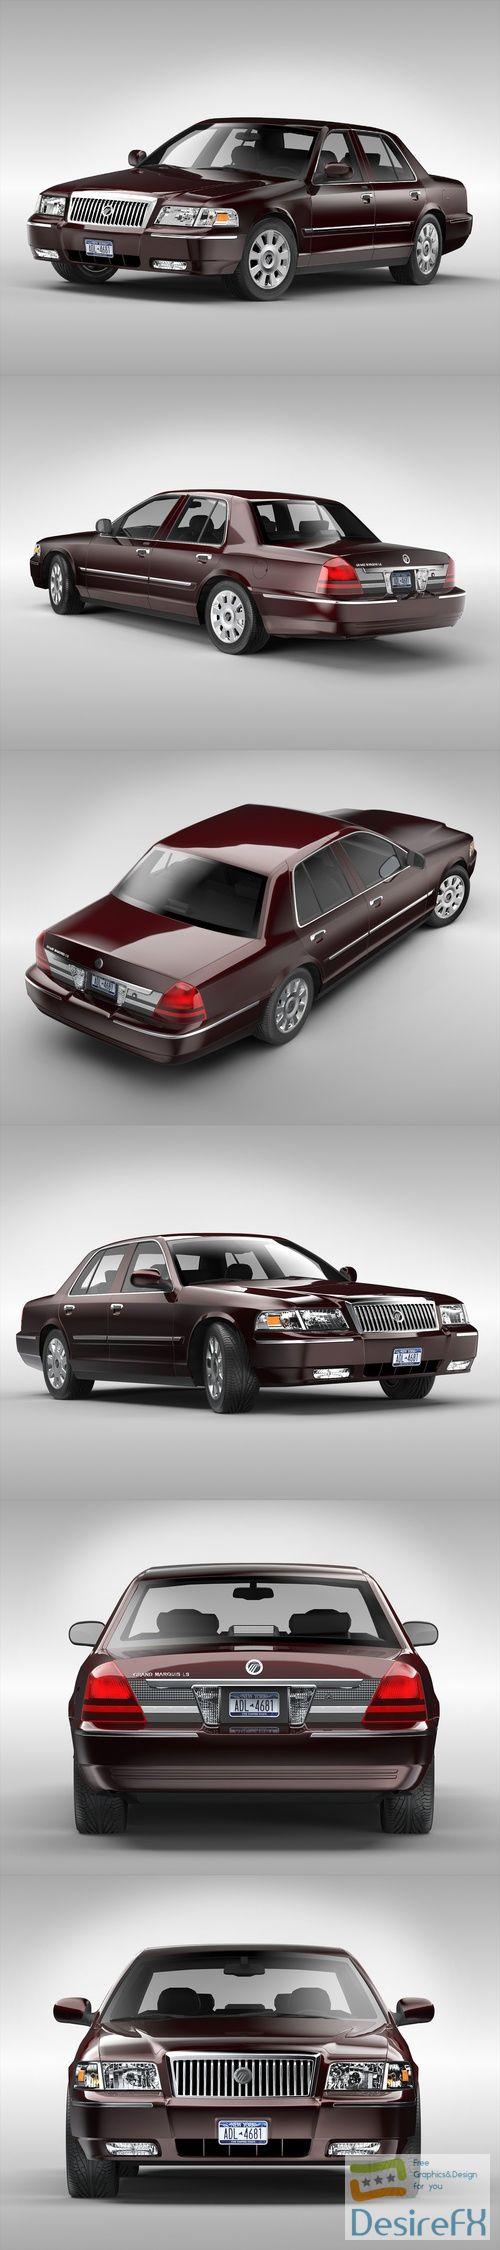 Mercury Grand Marquis 2003-2011 3D Model